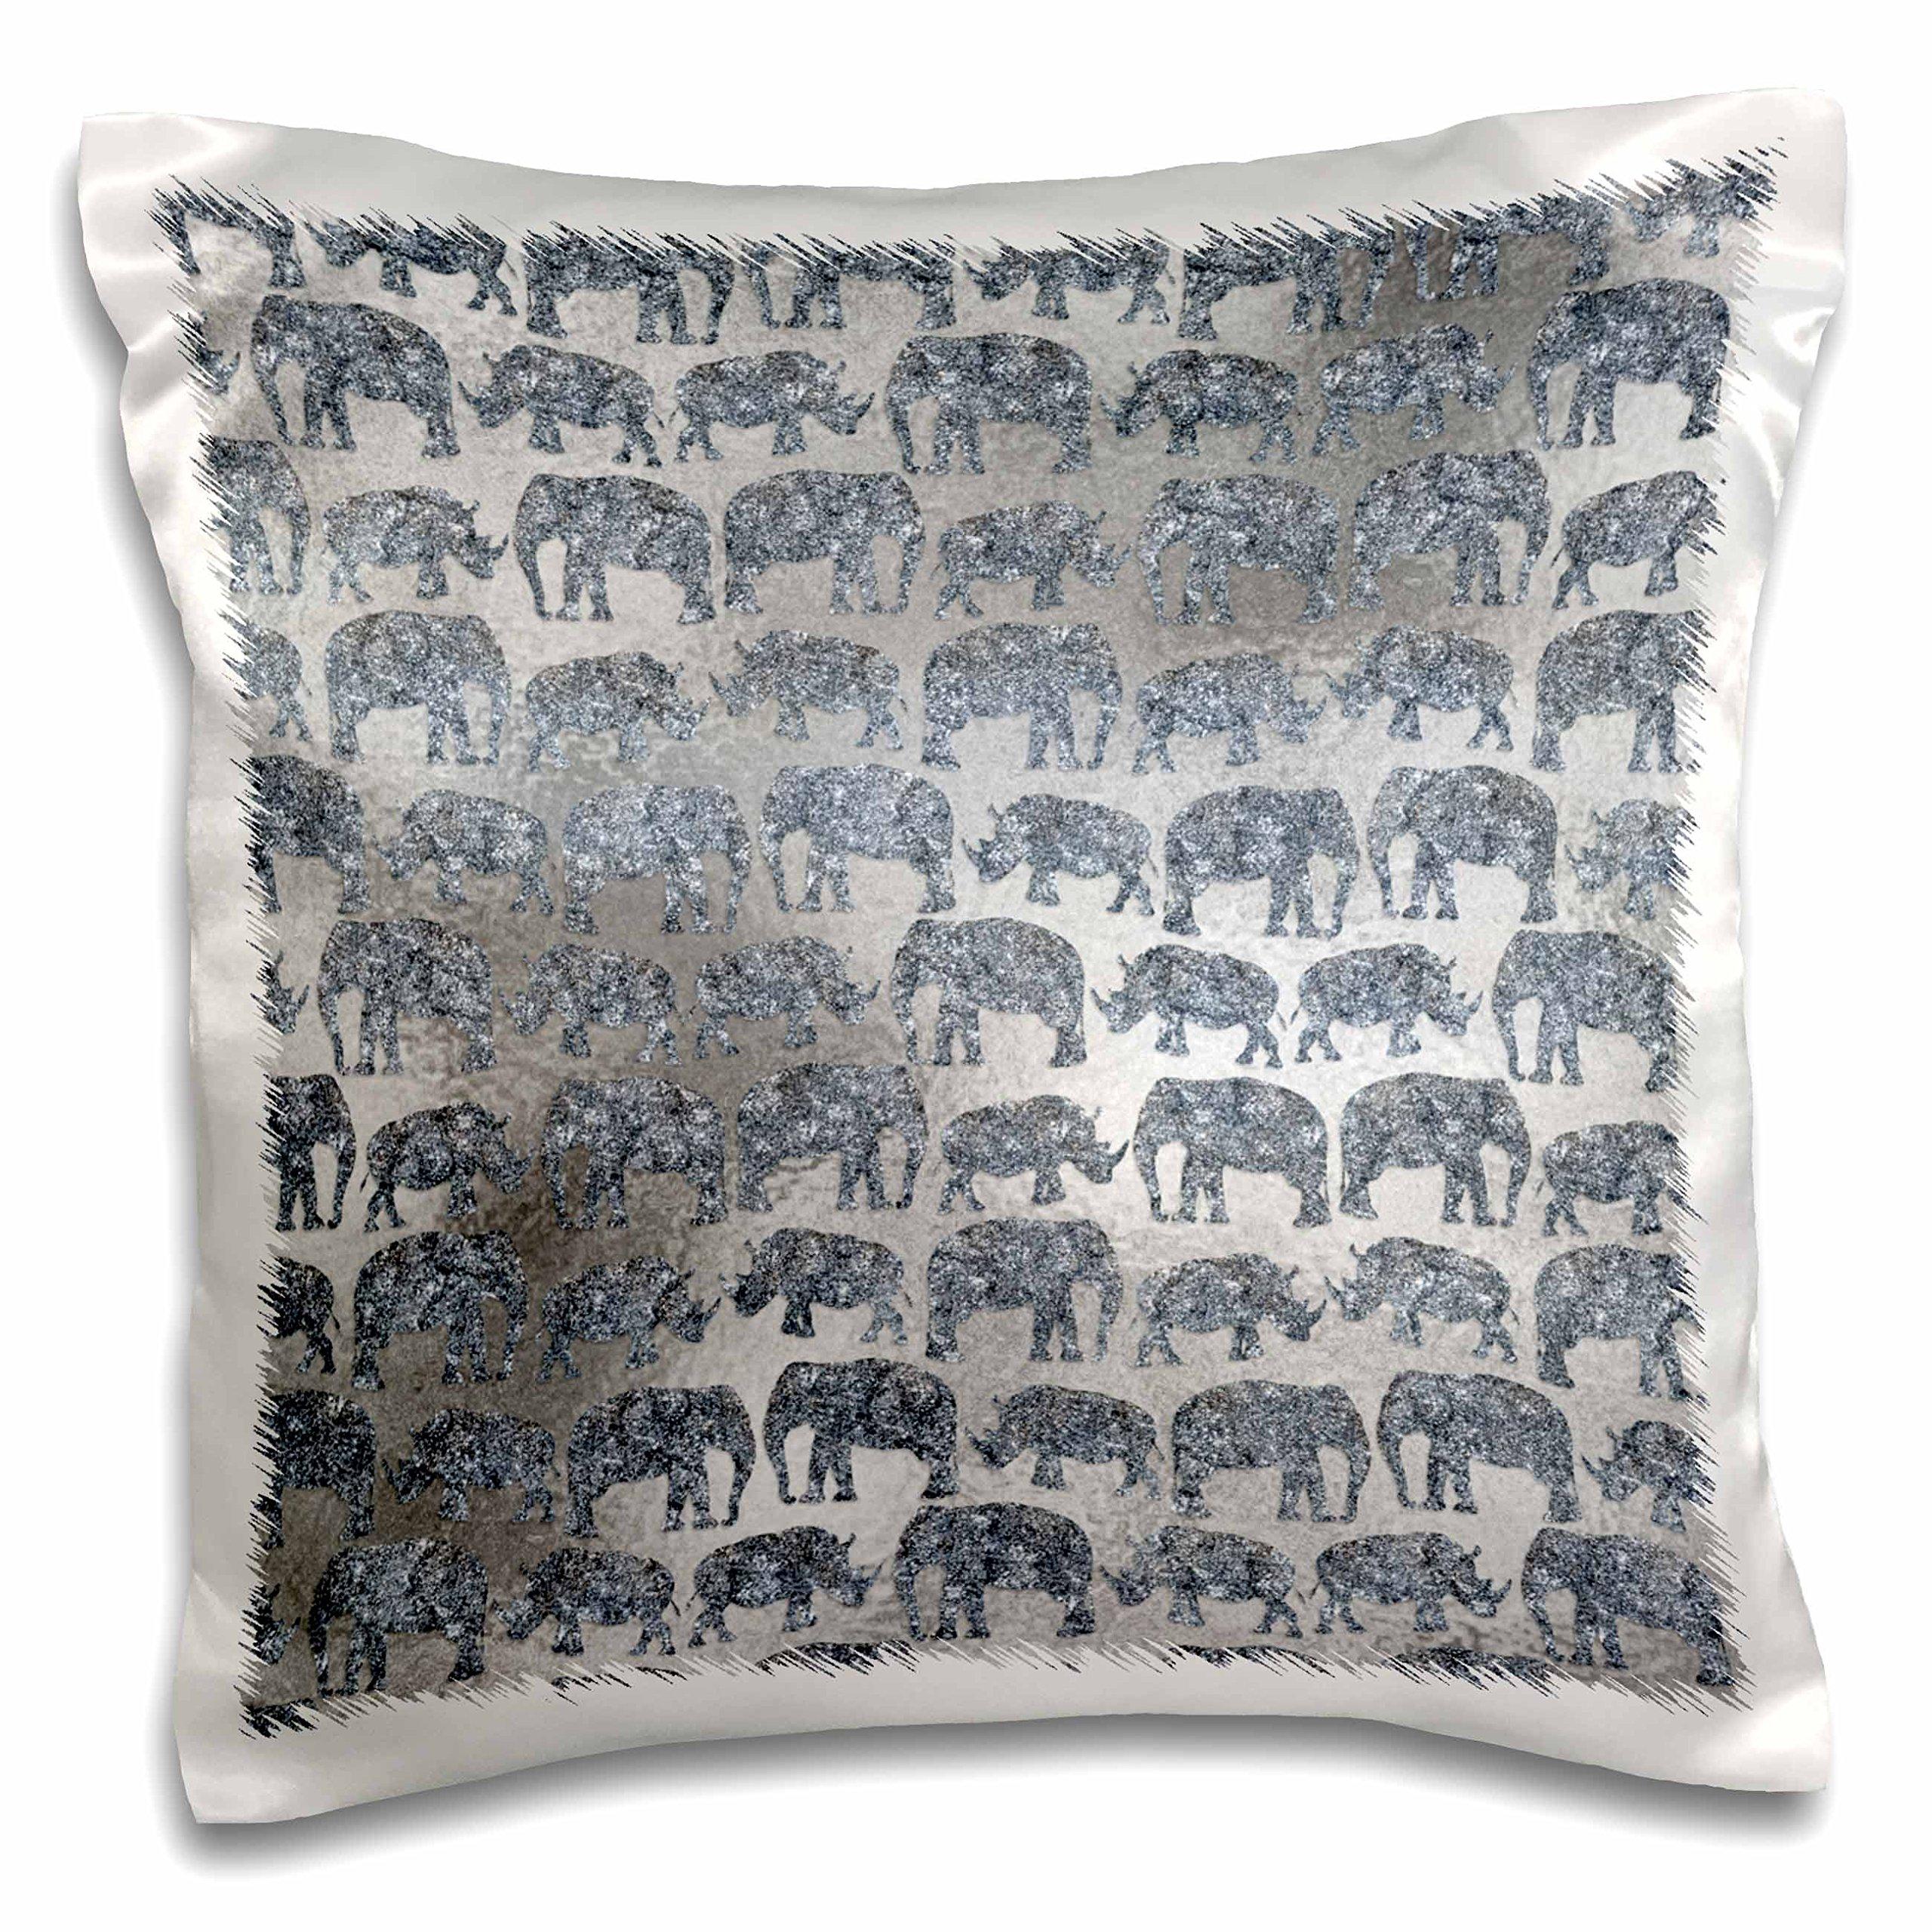 3dRose Luxury Silver Shiny Chic Animal Elephant Africa Safari Pattern Pillow Case, 16 x 16''